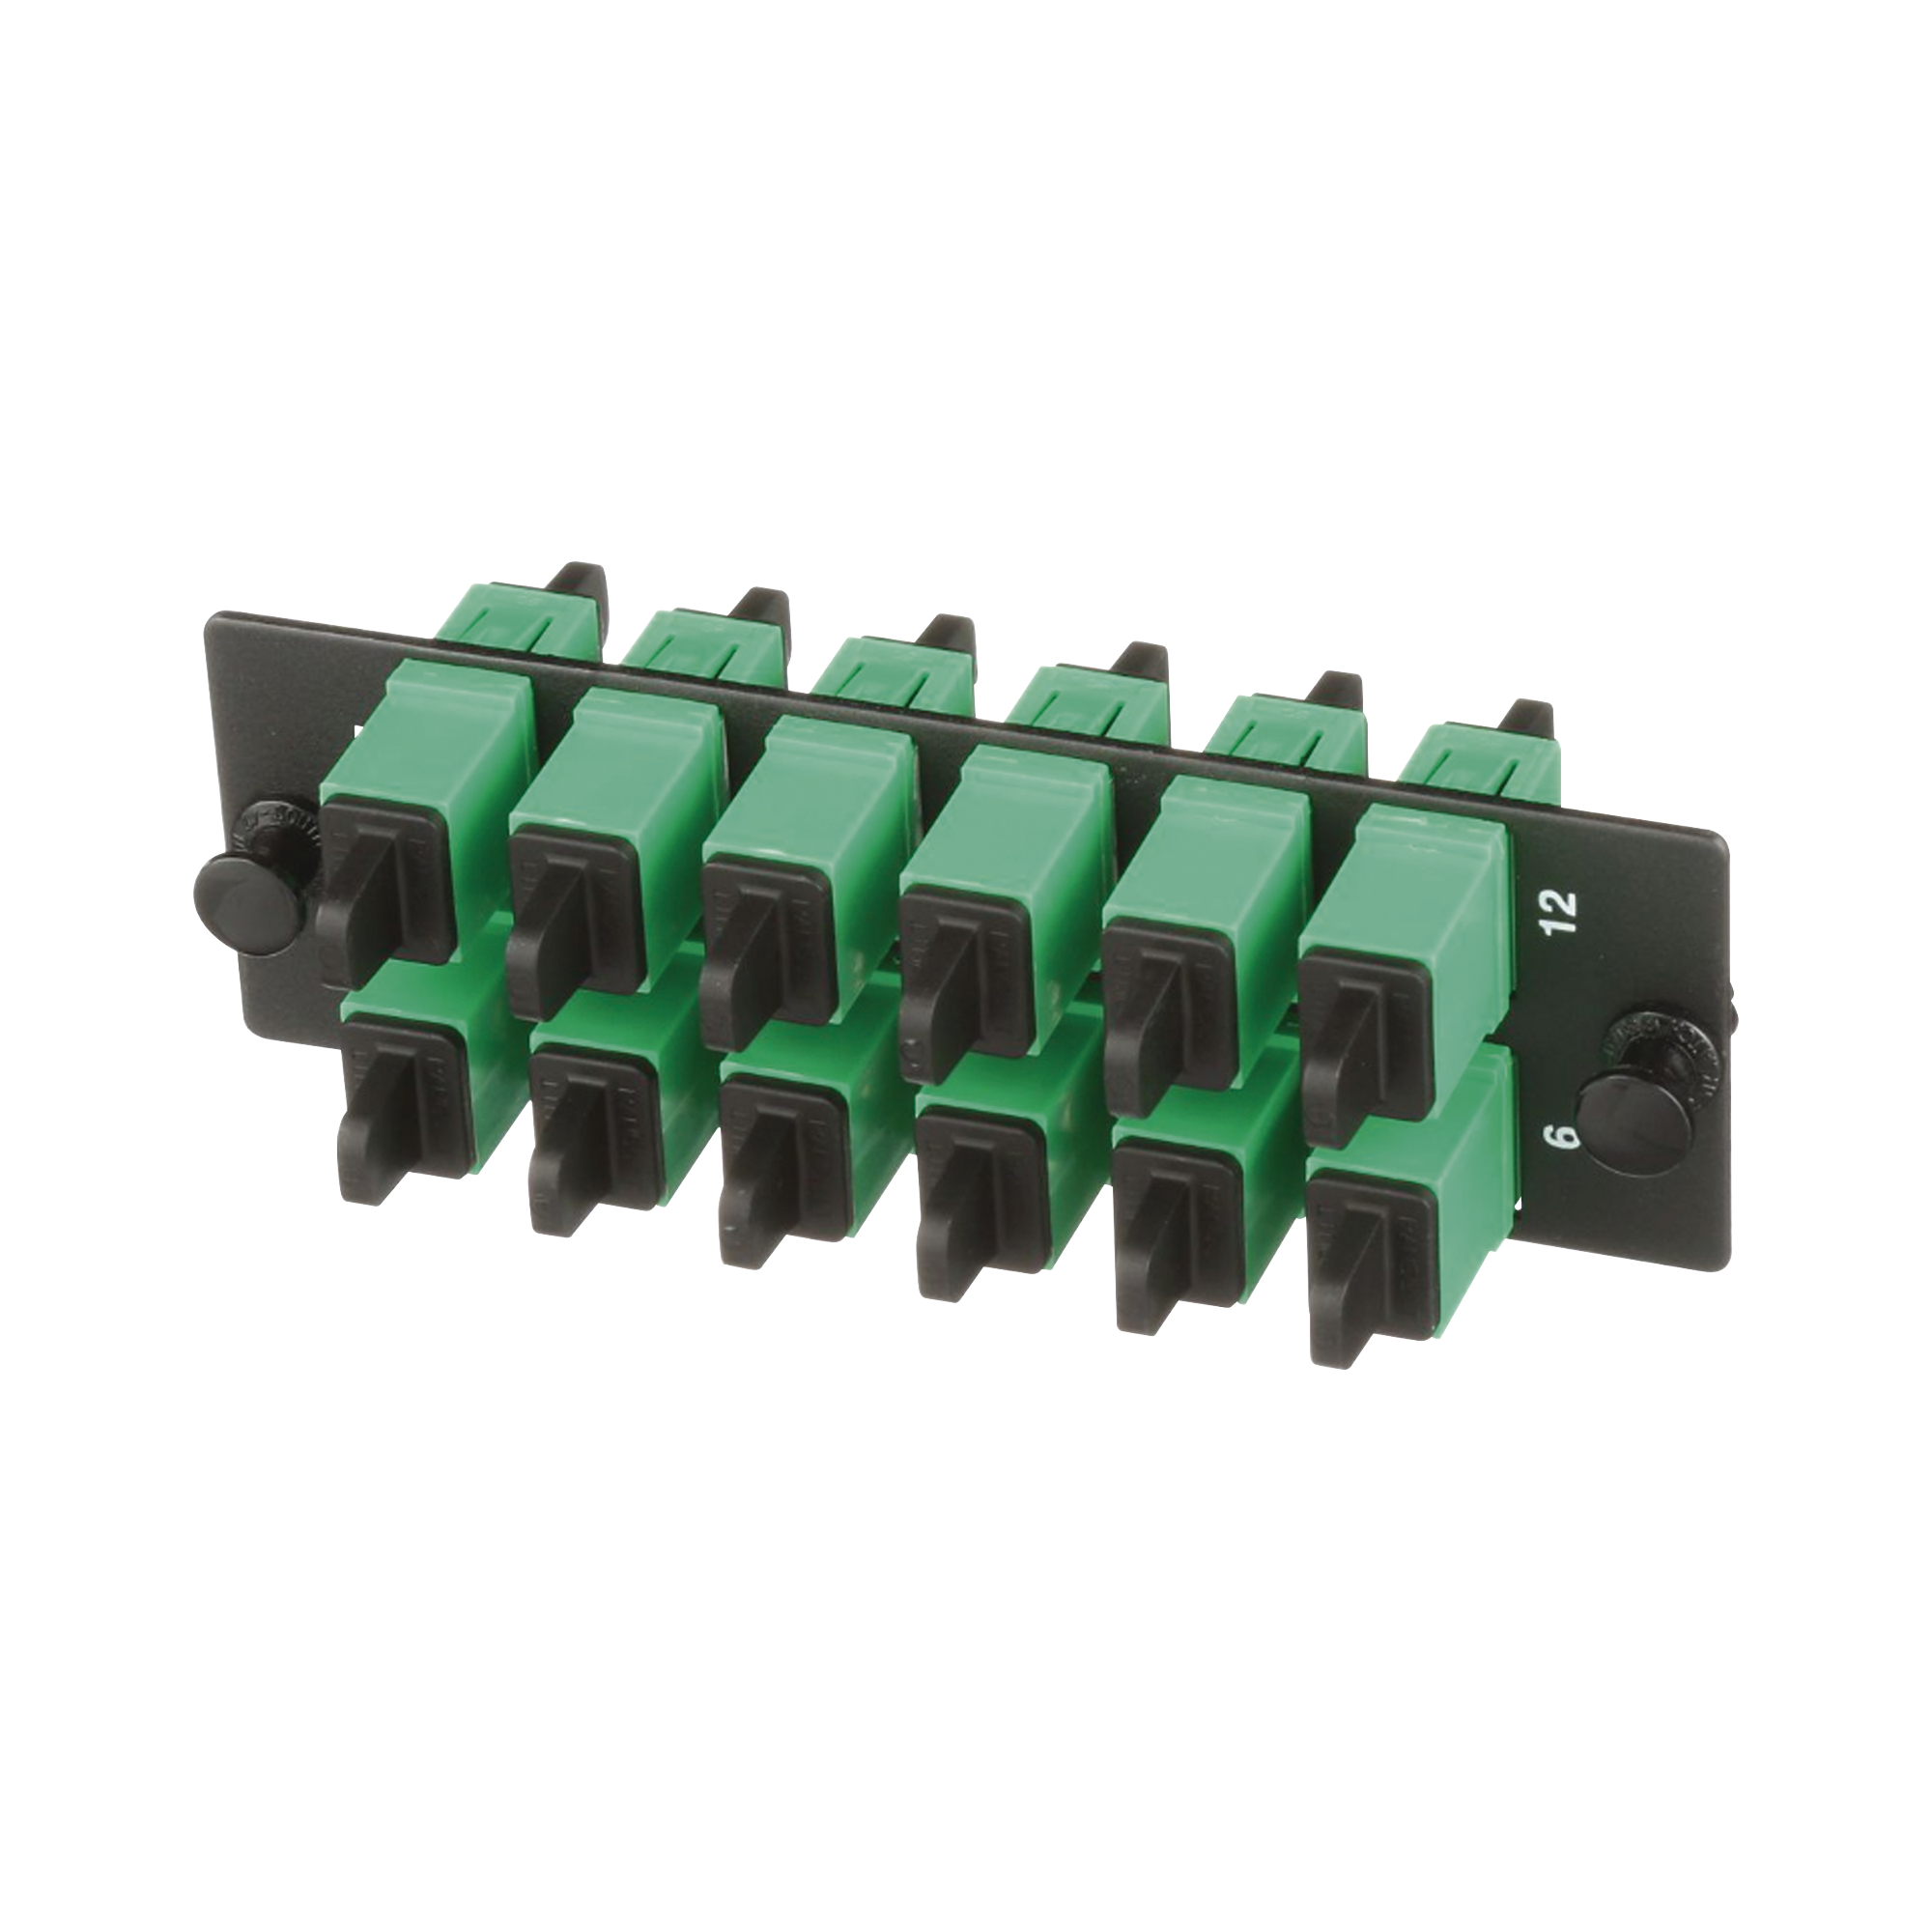 Placa Acopladora de Fibra Optica FAP, Con 12 Conectores SC/APC (12 Fibras), Para Fibra Monomodo OS1/OS2, Color Verde